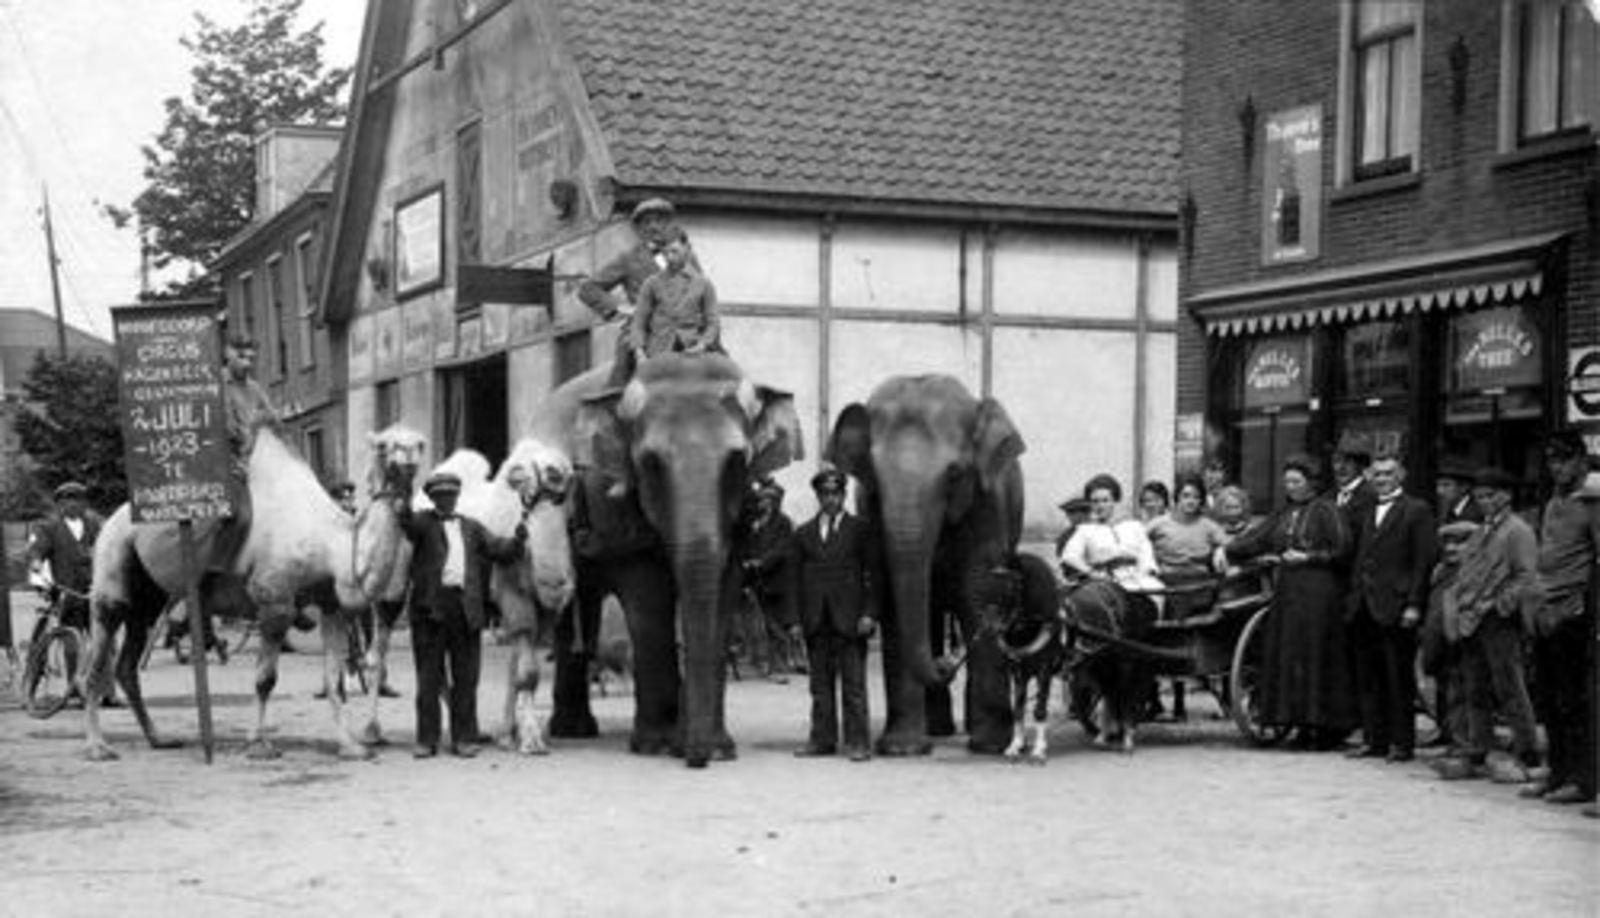 Marktplein N 0041 1923 Circus Hagenbeek bij Kruidenier v Exter